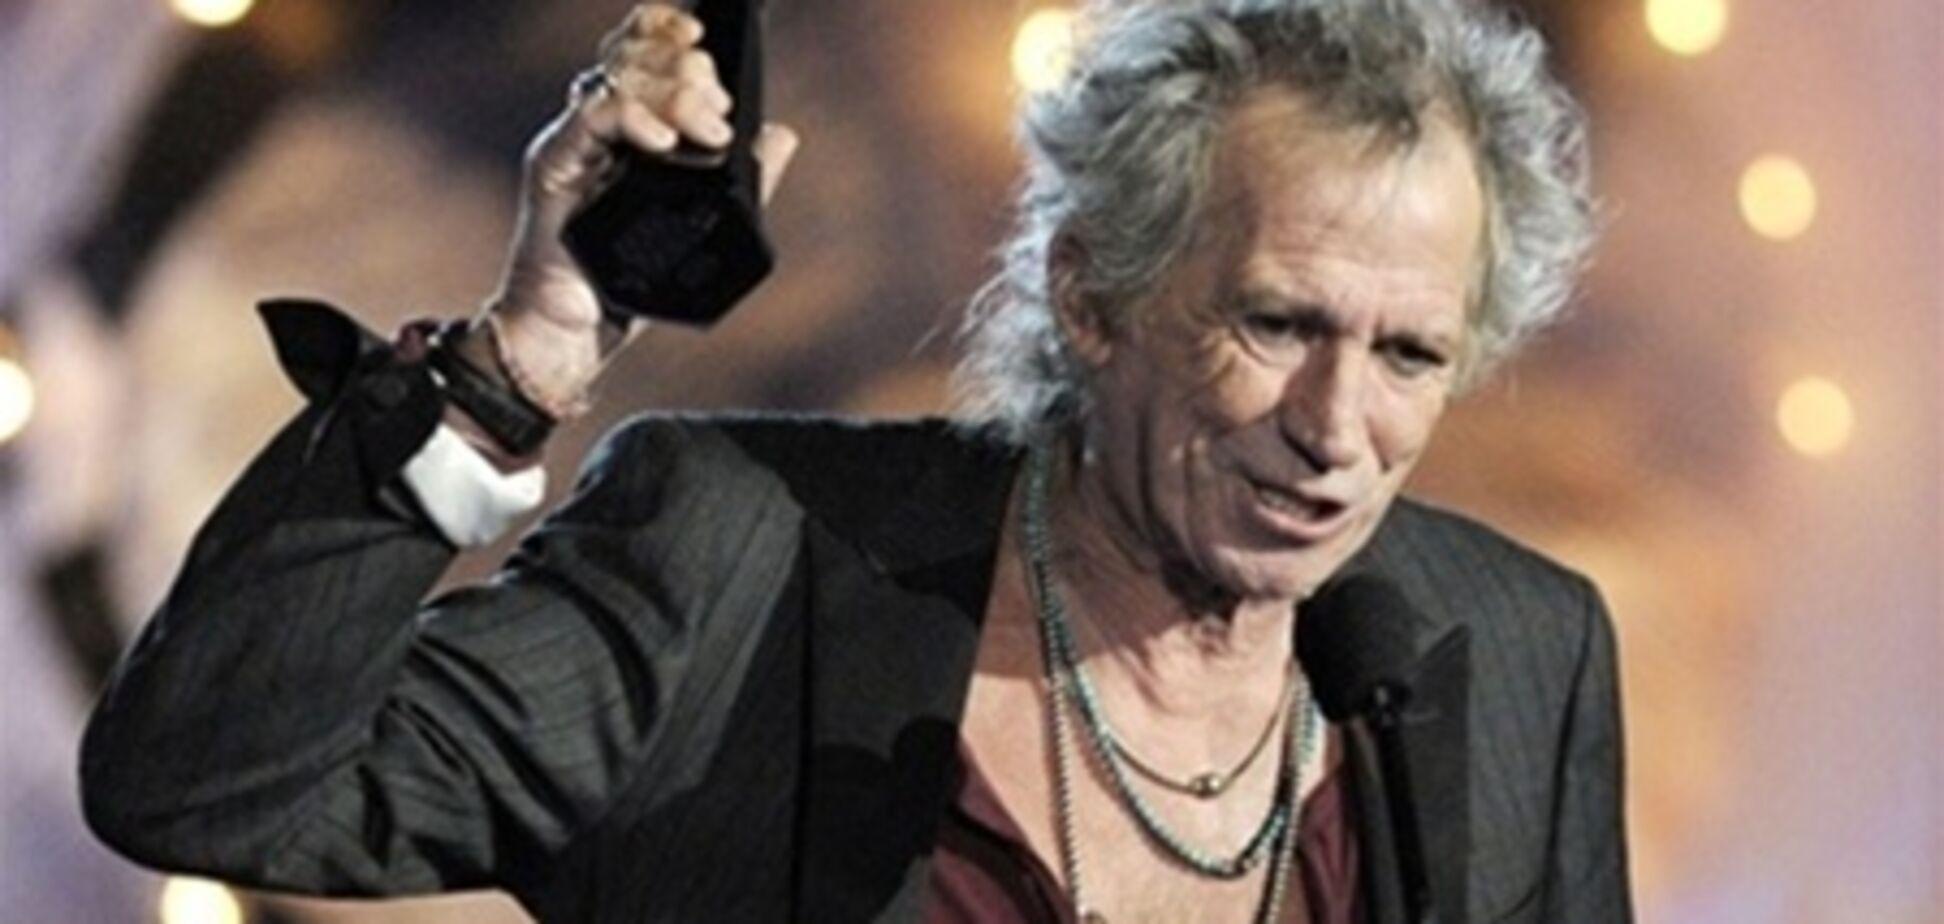 Гитаристу The Rolling Stones светит штраф за долг полувековой давности